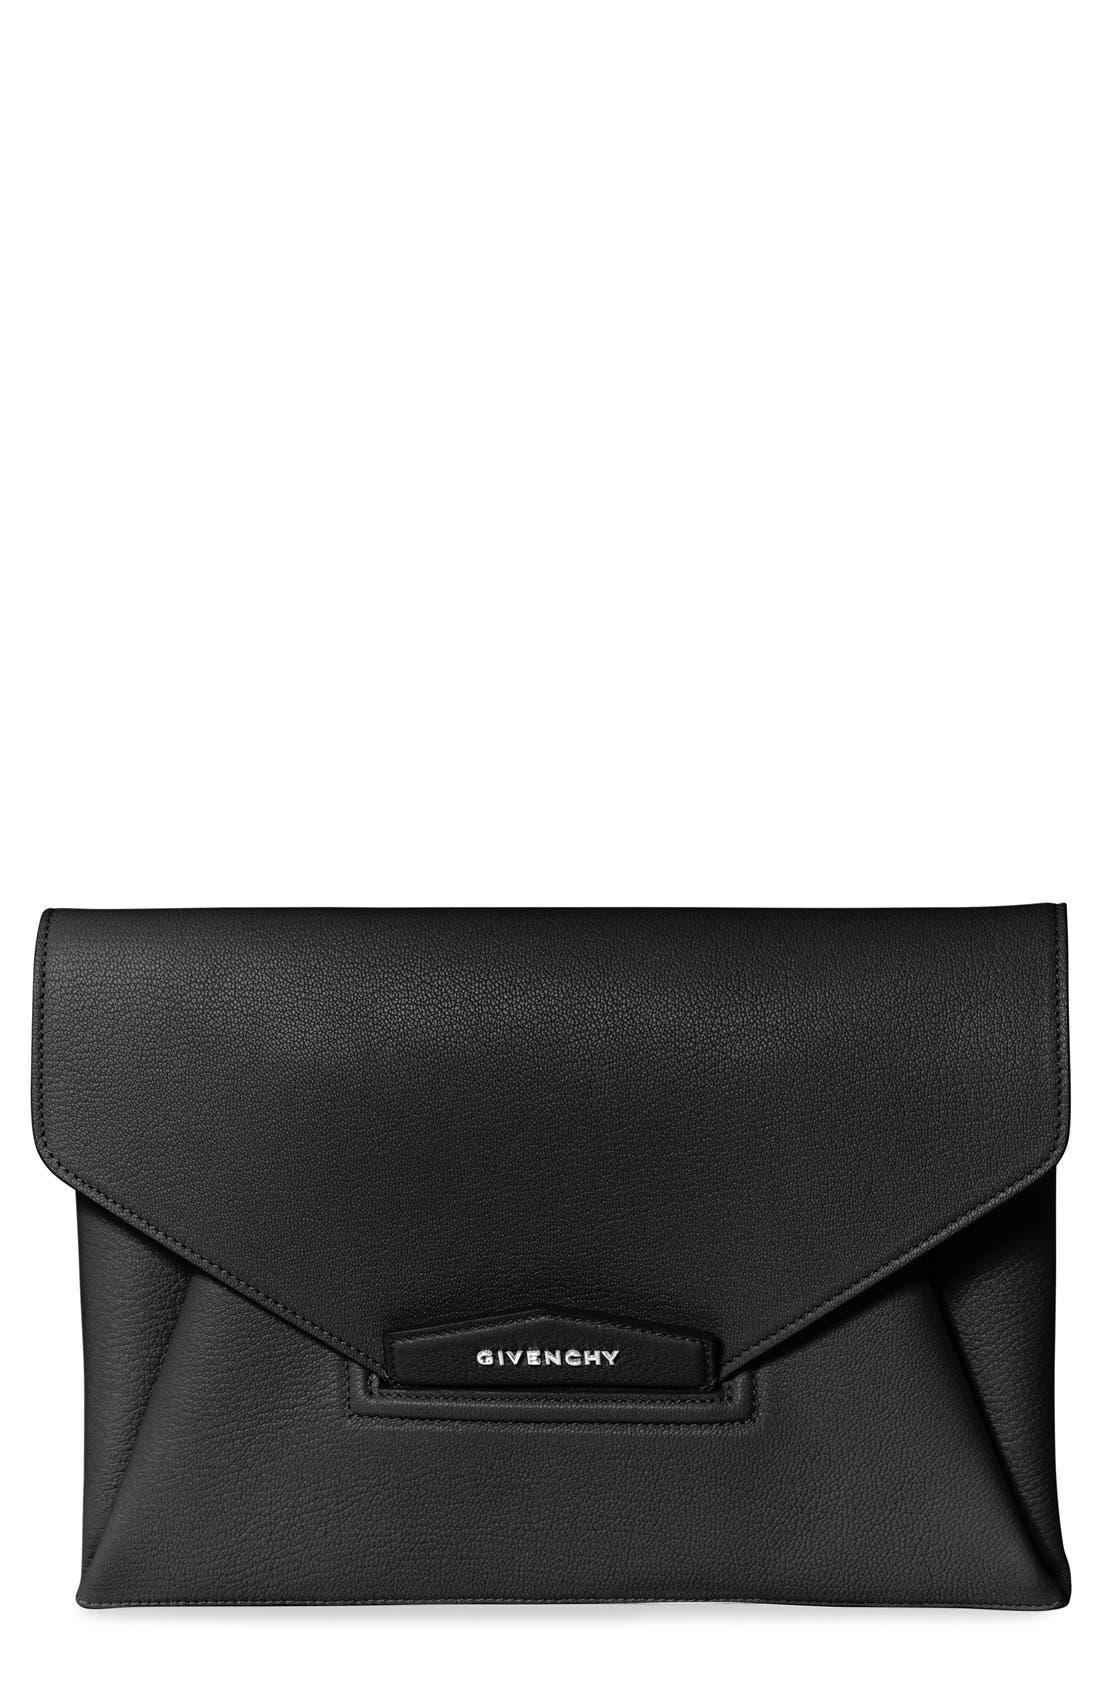 Givenchy 'Medium Antigona' Leather Envelope Clutch